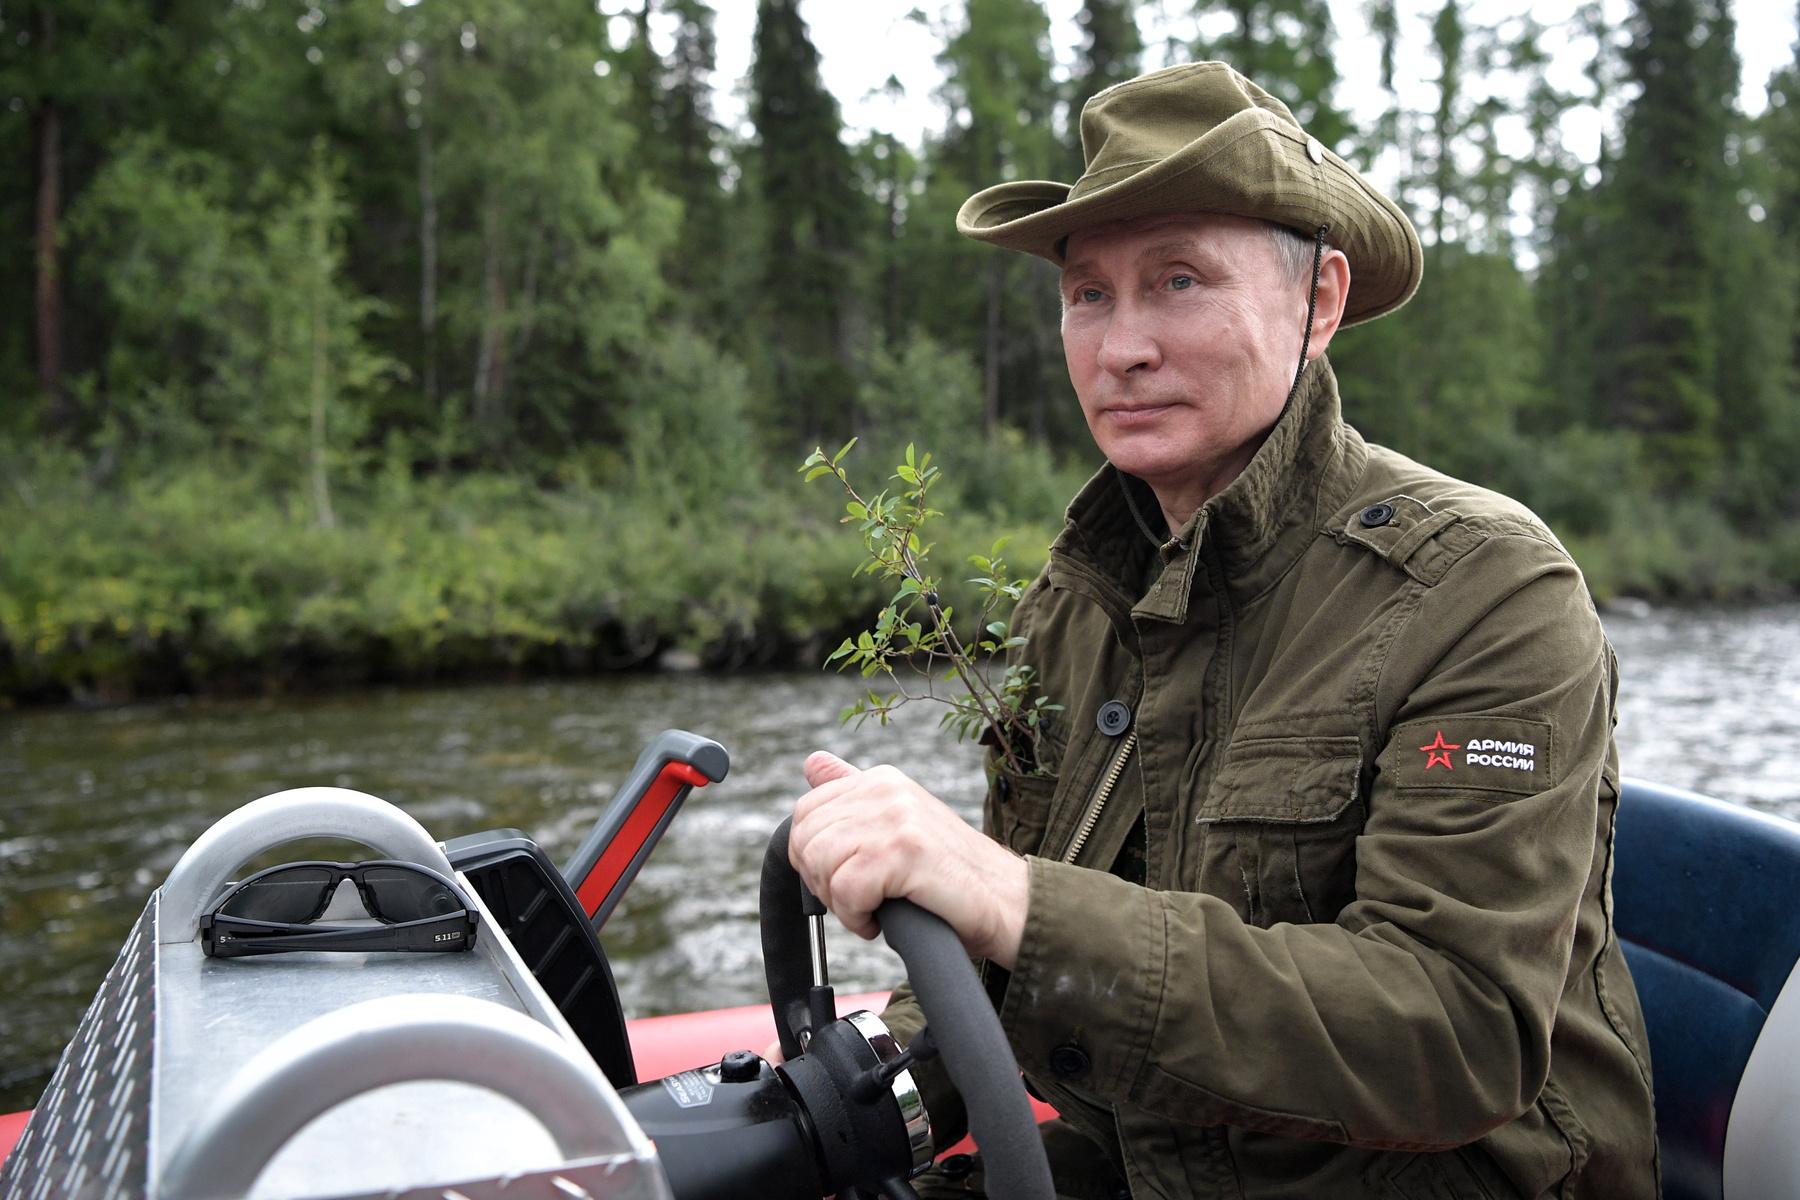 Putyin hallal pózol.